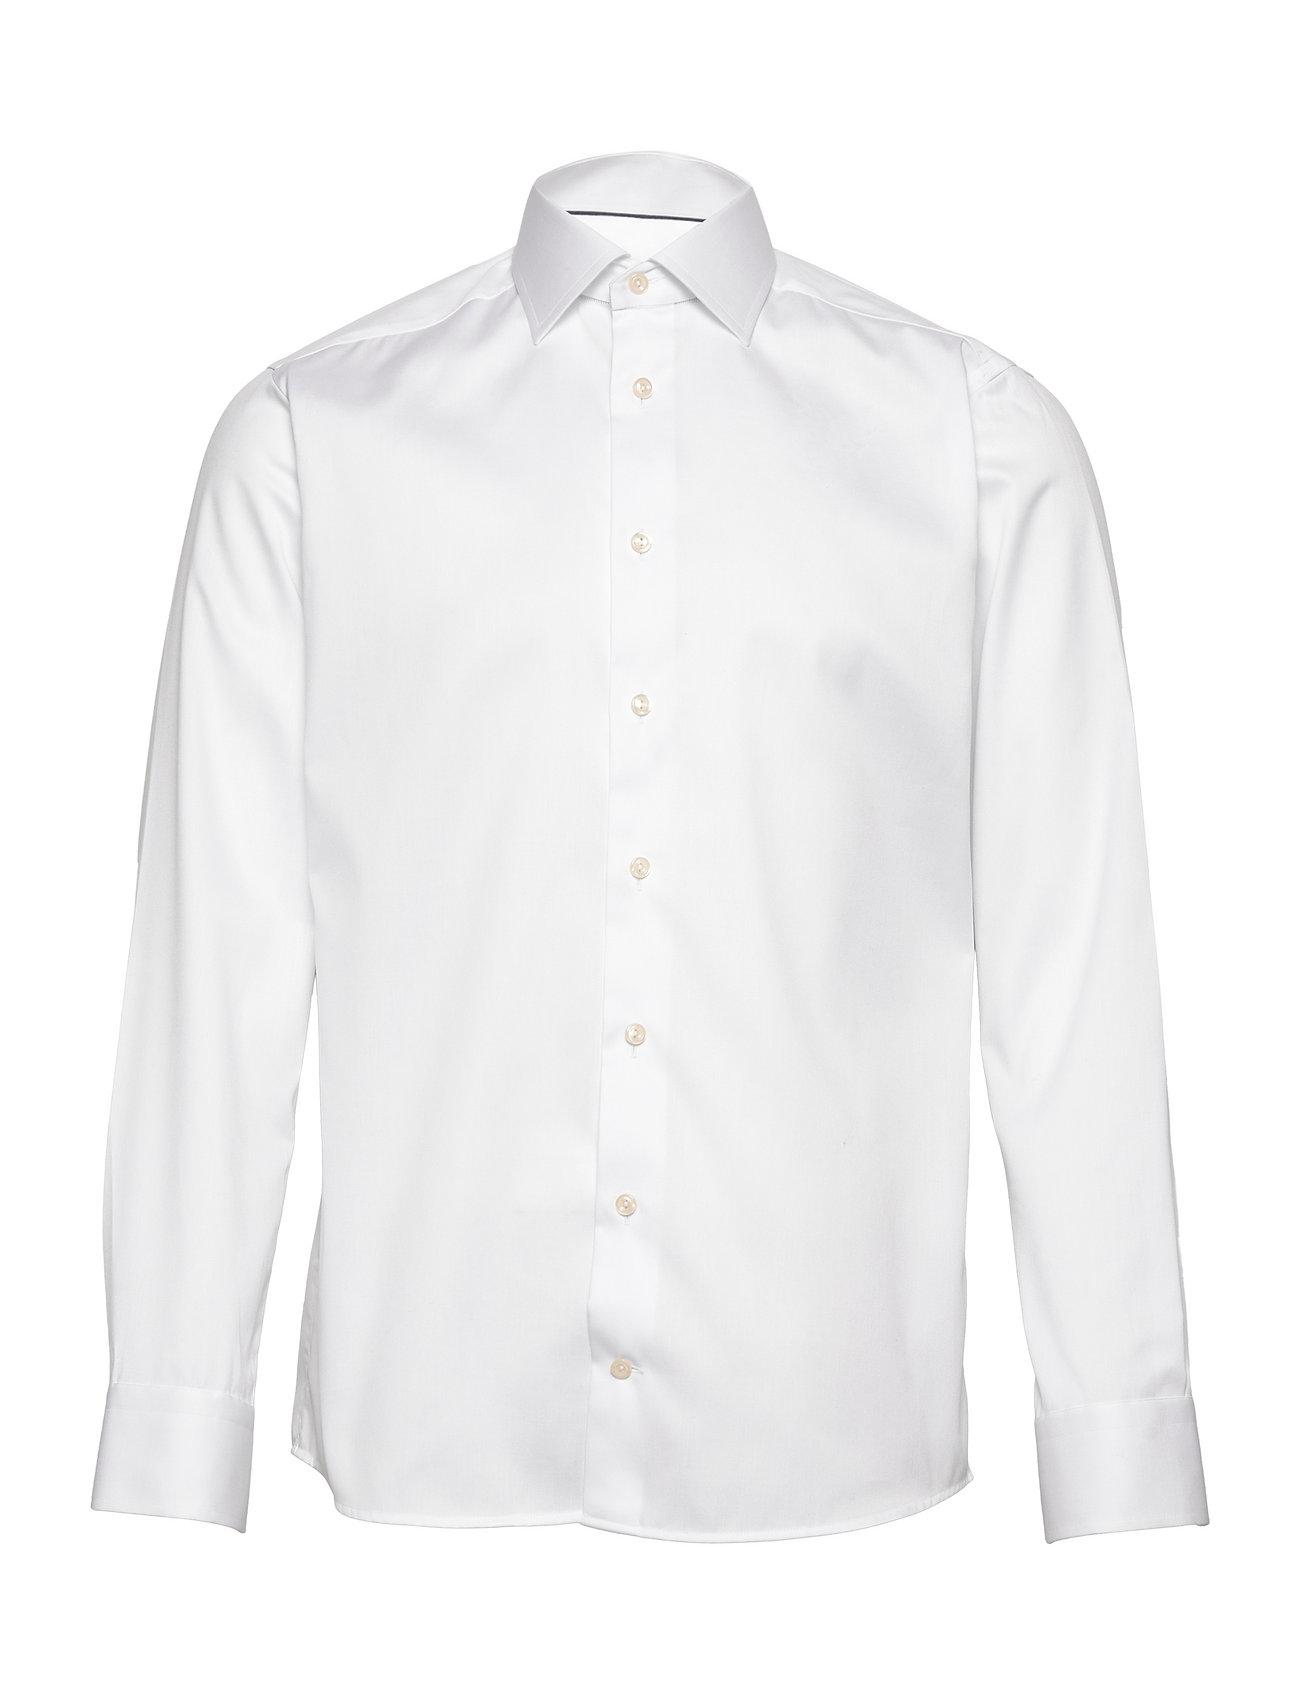 Eton Cambridge-Collection-Slim fit - WHITE